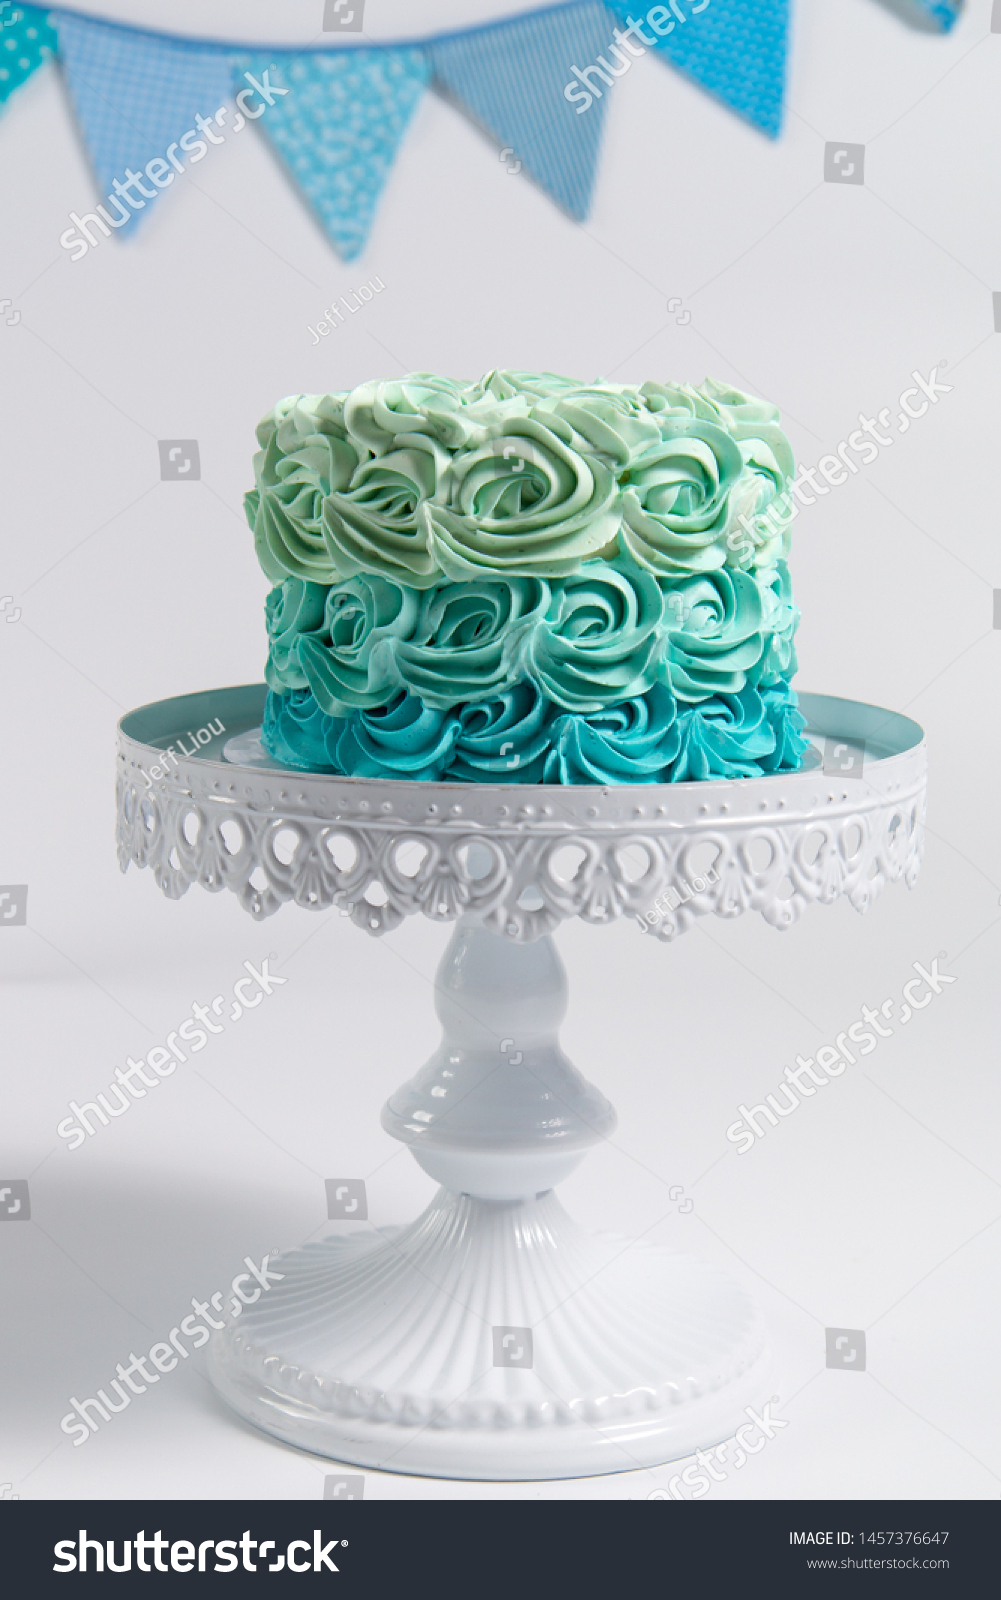 Stupendous Birthday Cake On Stand Cake Smash Stock Photo Edit Now 1457376647 Funny Birthday Cards Online Kookostrdamsfinfo